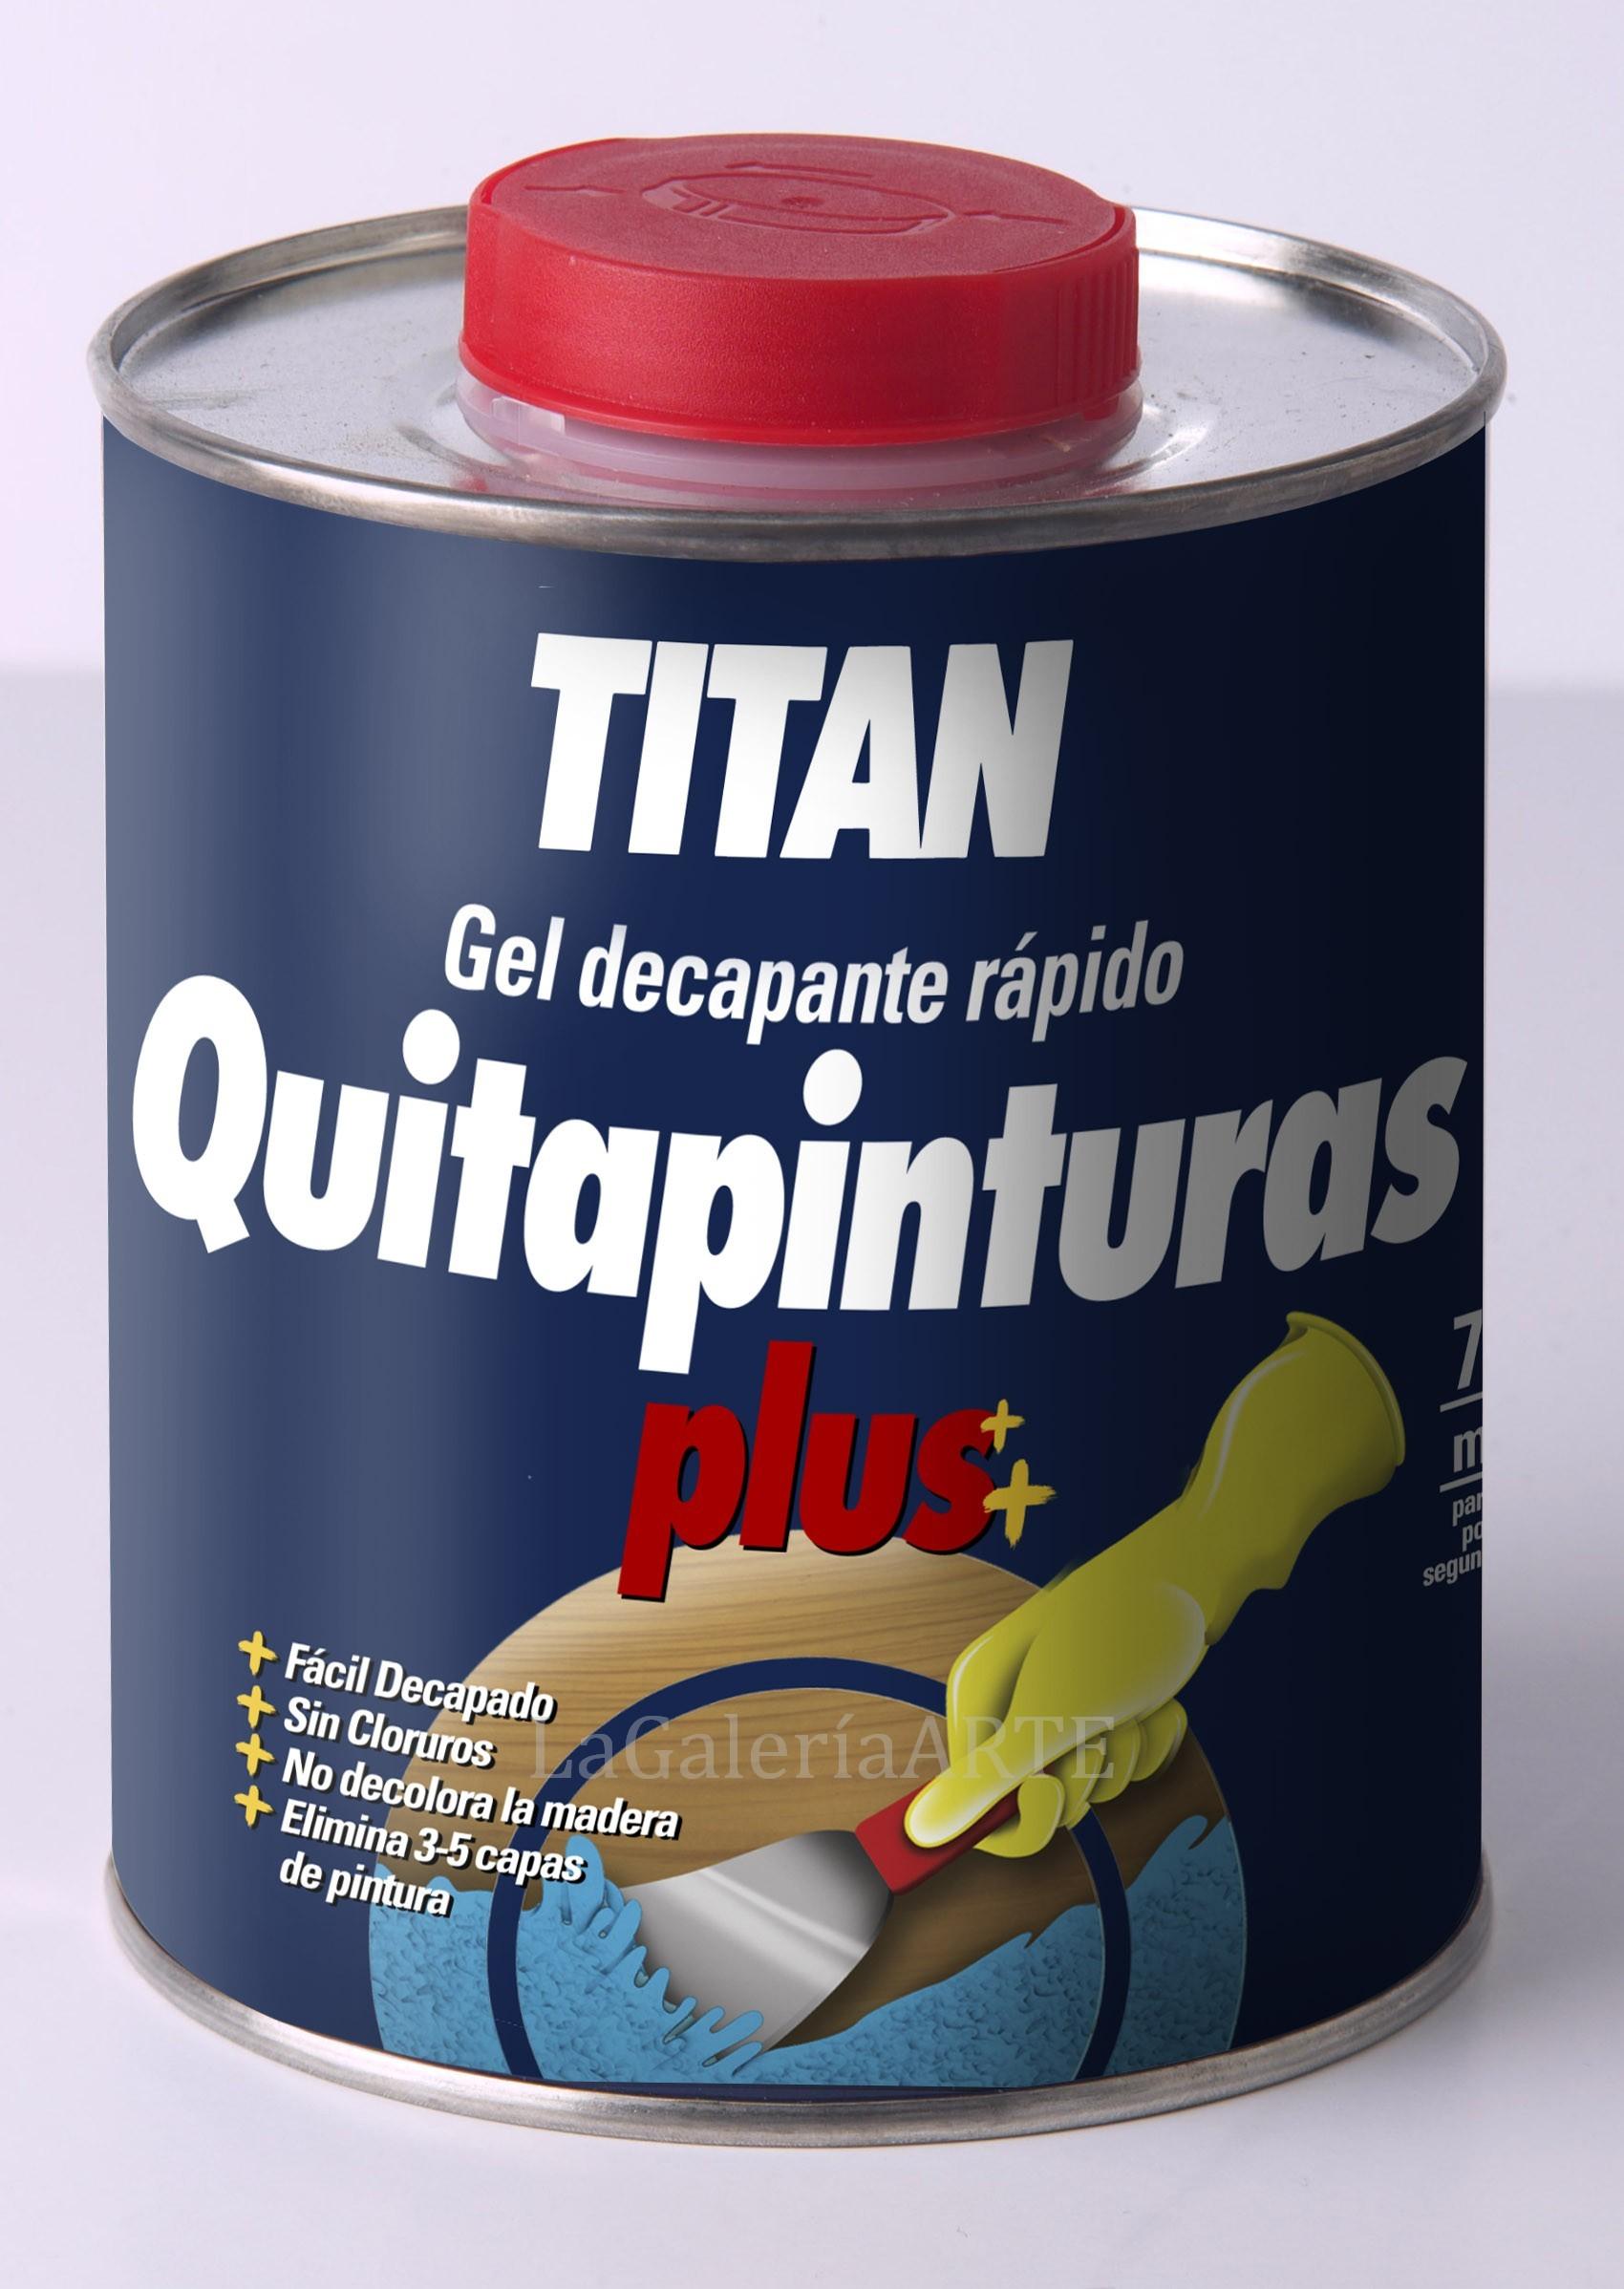 Quitapinturas Plus Gel Decapante Rapido TITAN 750ml